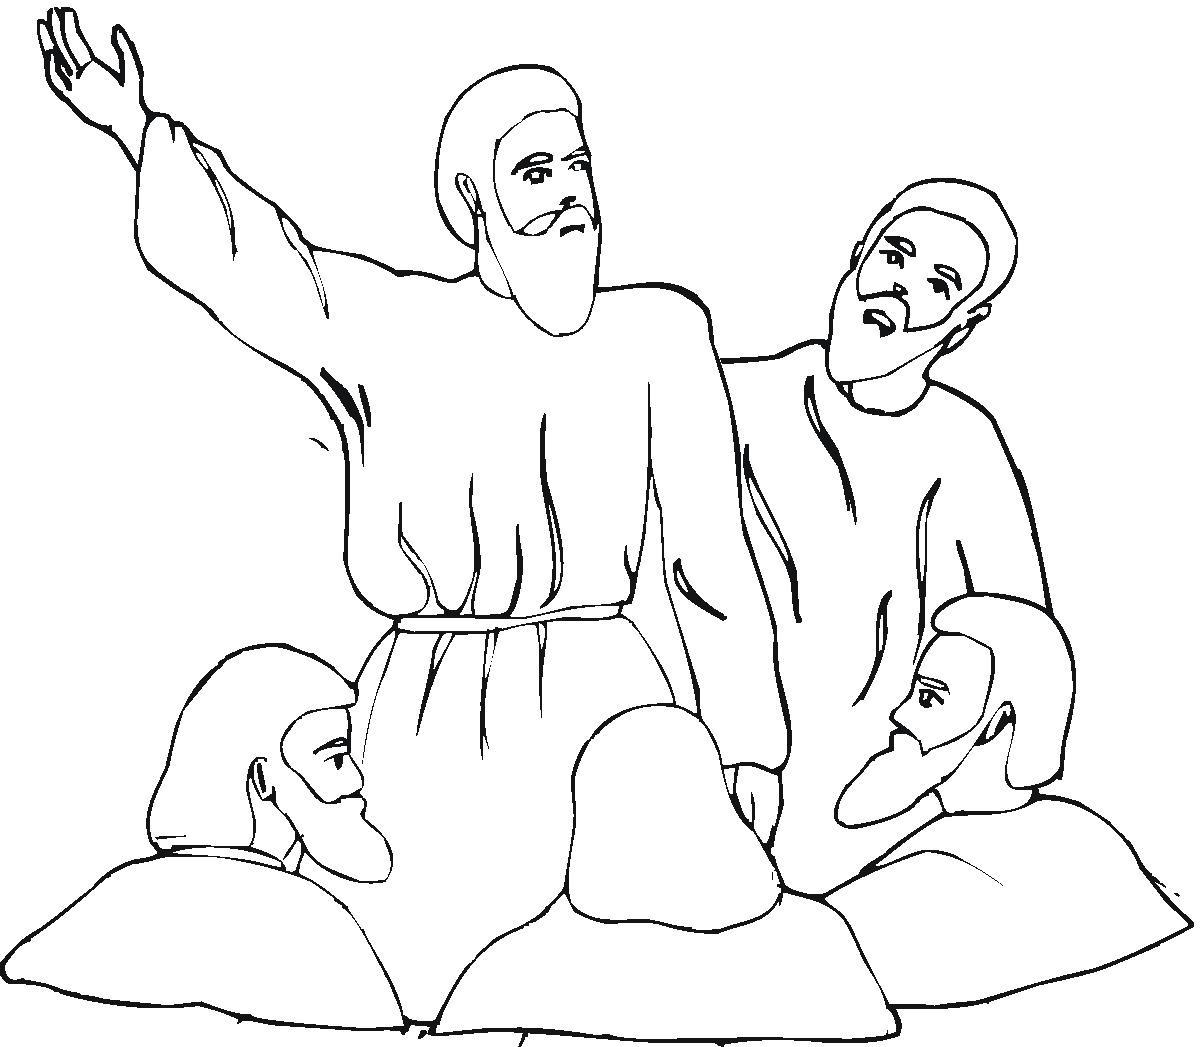 Isaiah coloring page